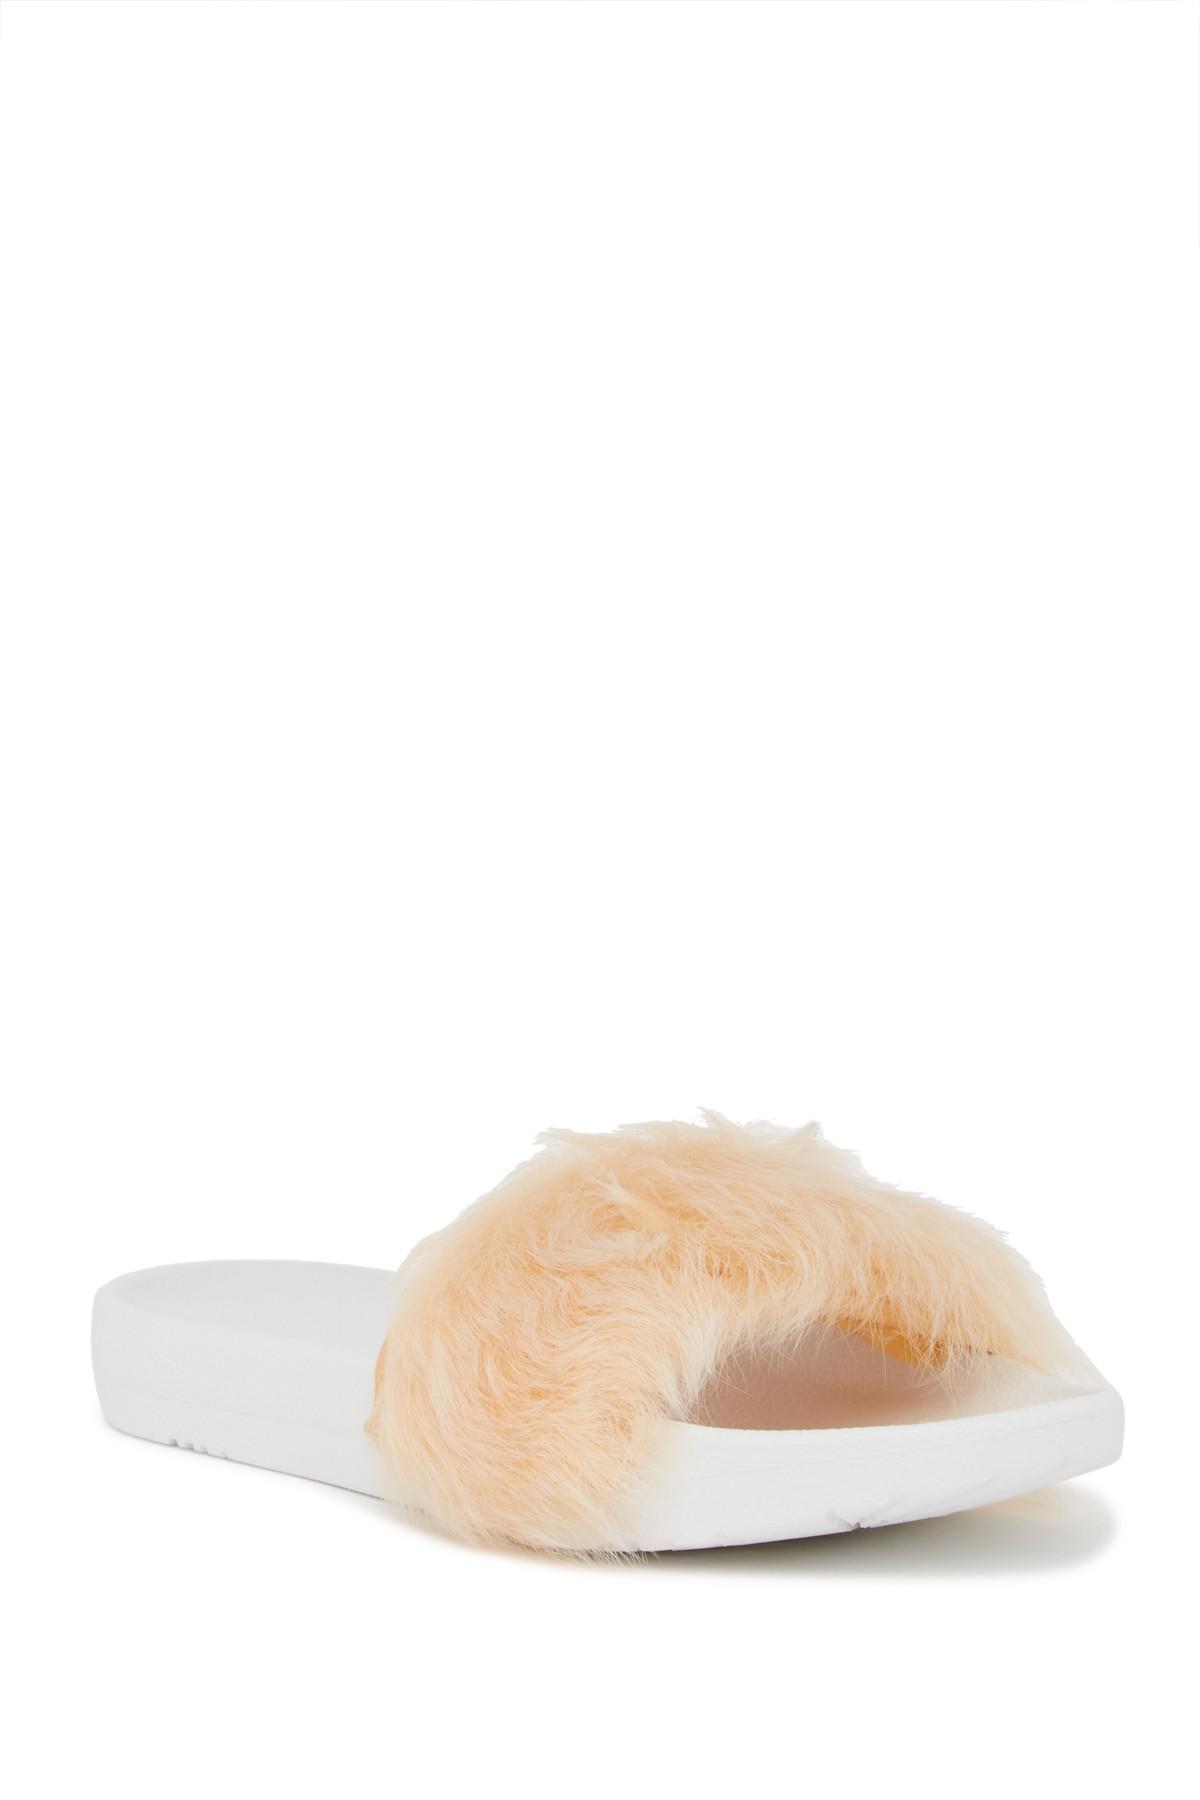 UGG Royale Genuine Lamb Fur Slide bKfD8NSbr